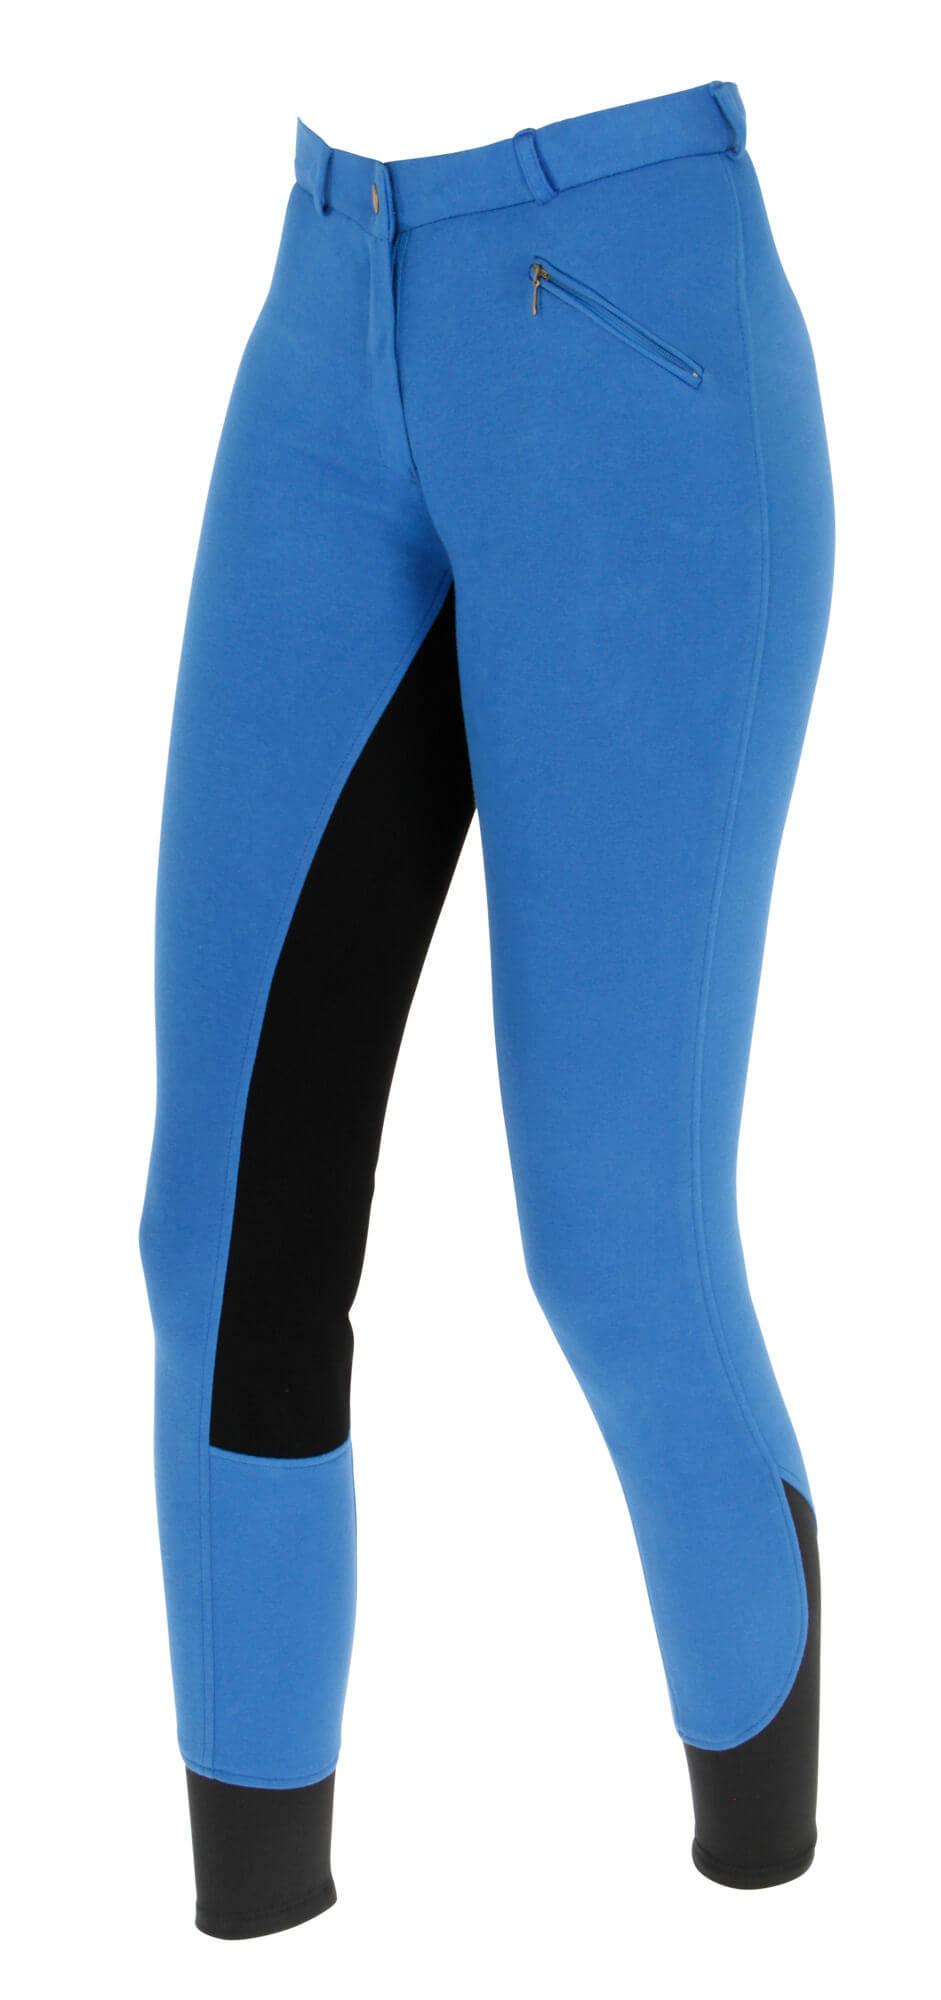 Reithandschuhe Hose MEGA Größe 34 36 38 40 42 Damen Vollbesatz Reithose blau